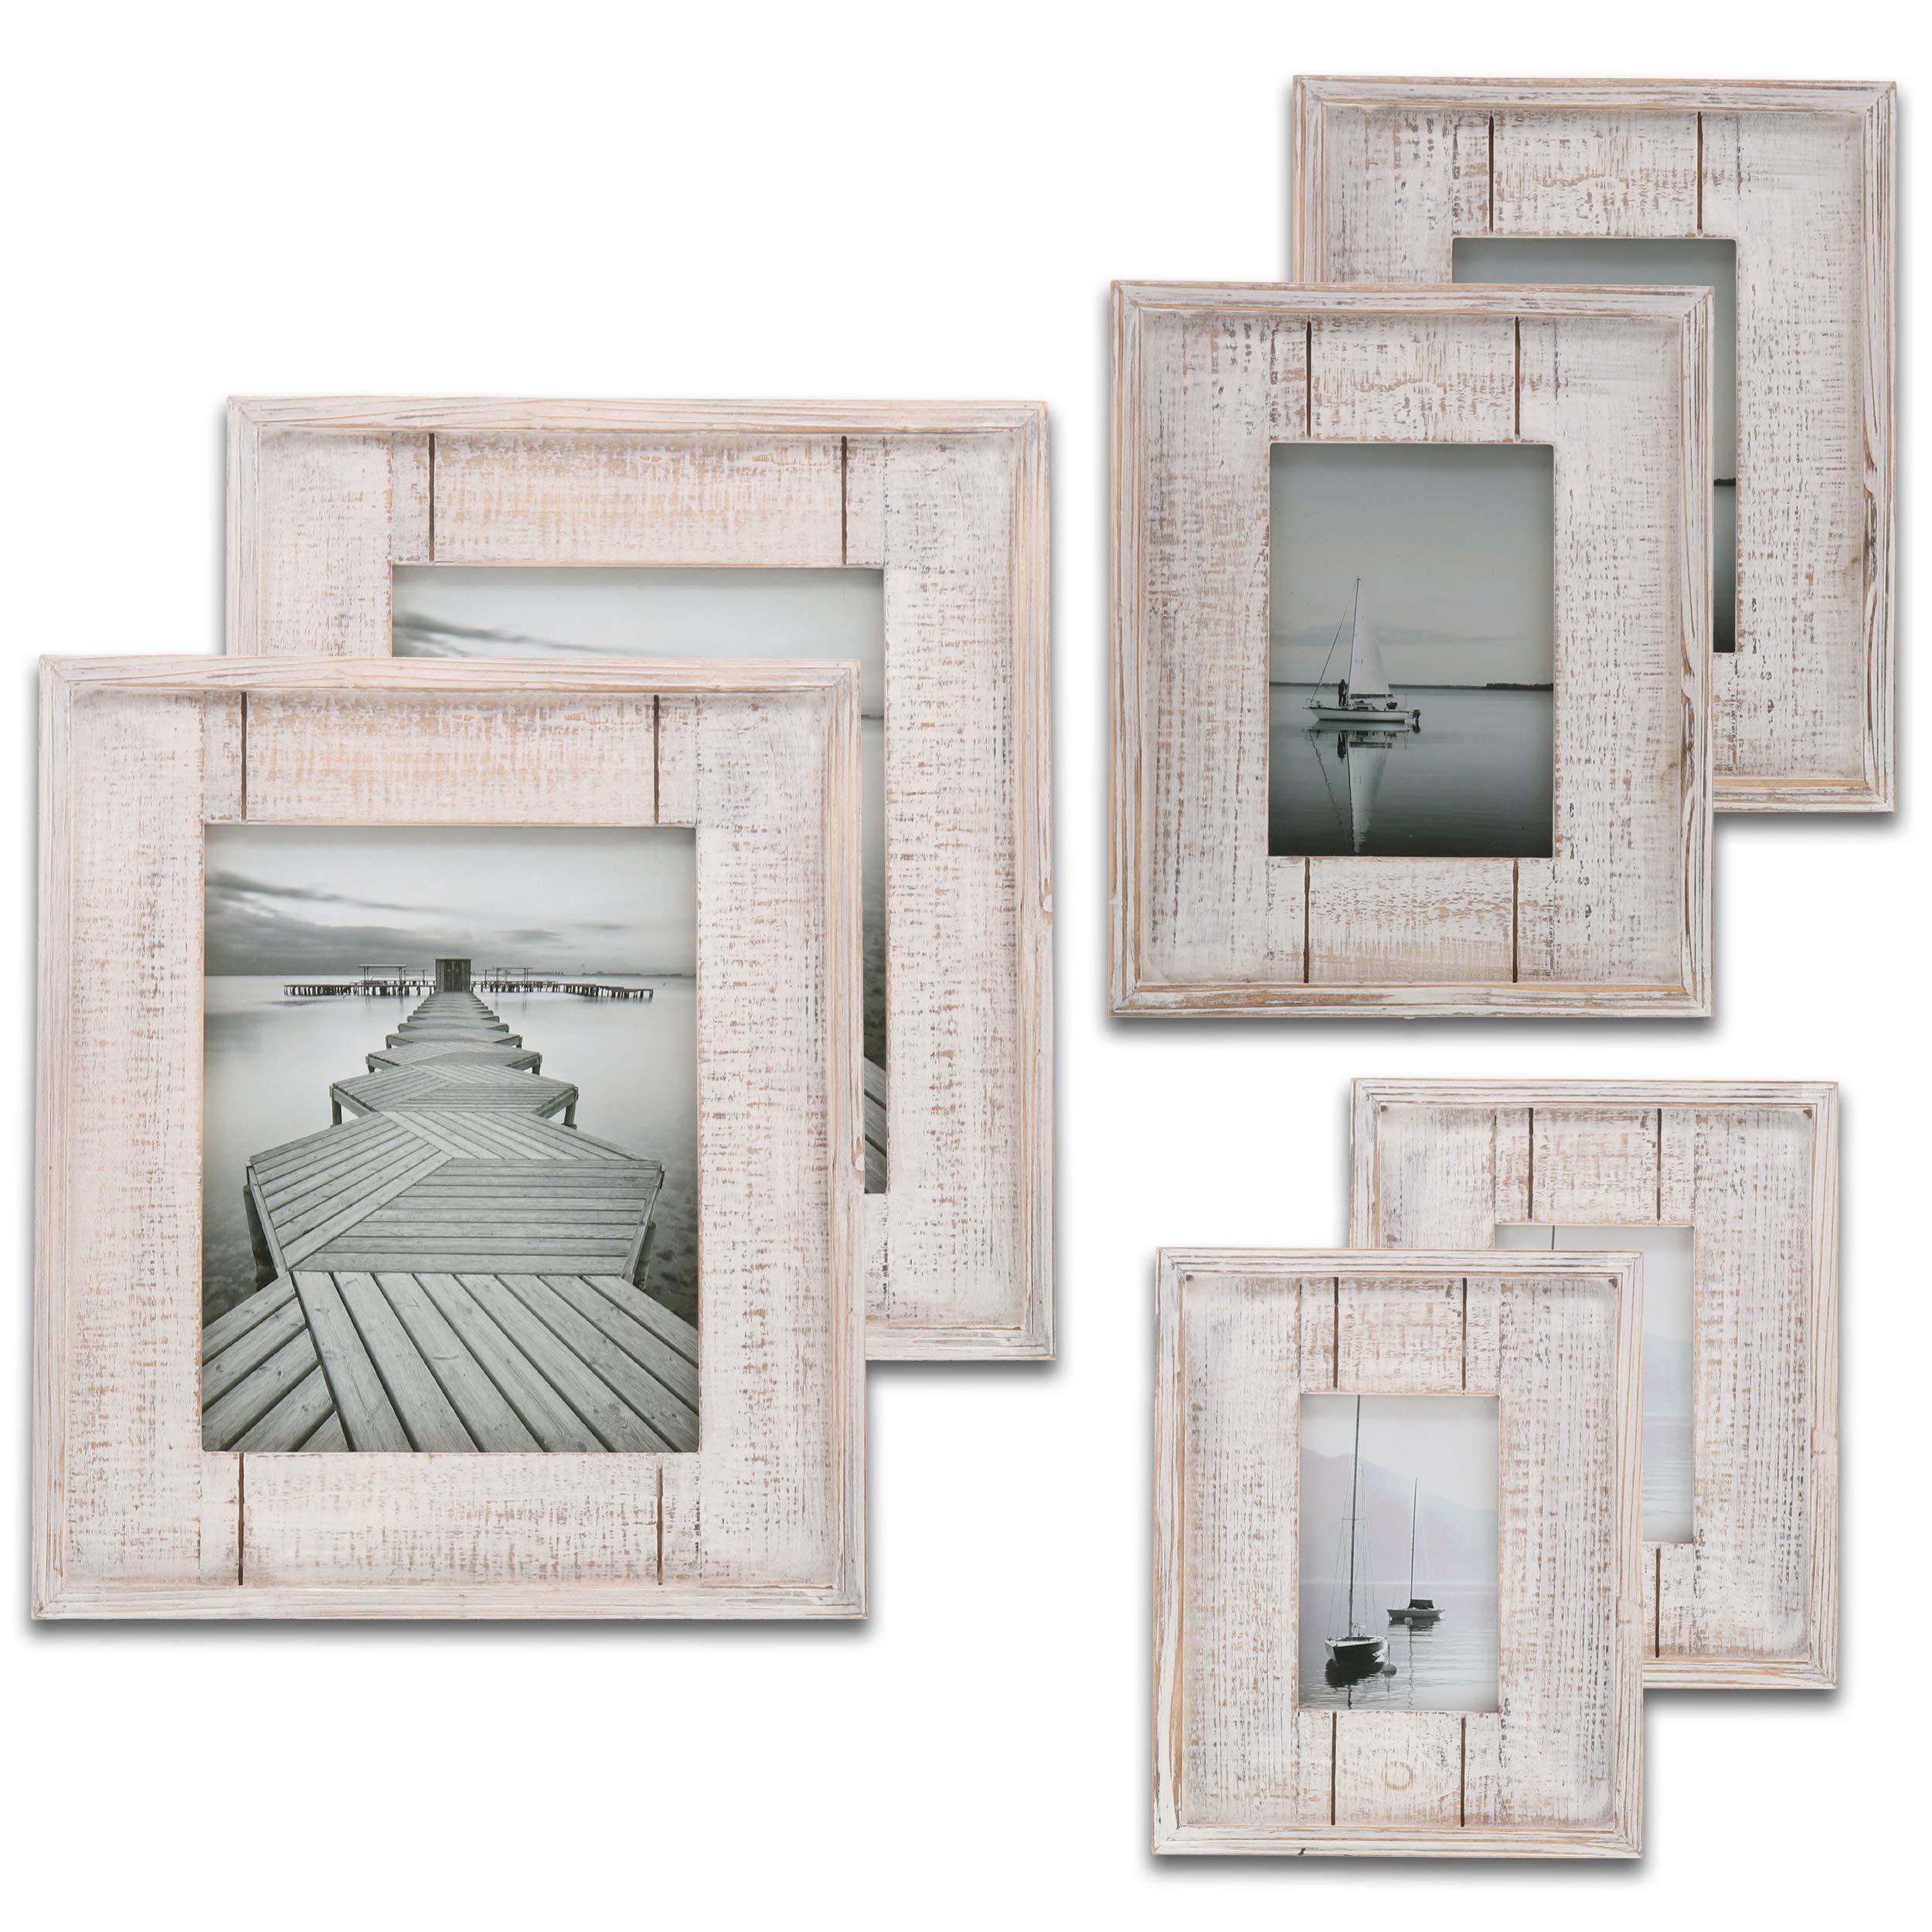 Barnyard Designs Rustic White Distressed Picture Frame - 6 Frames - 2X (4'' x 6'', 5'' x 7'', 8'' x 10'') Bundle by Barnyard Designs